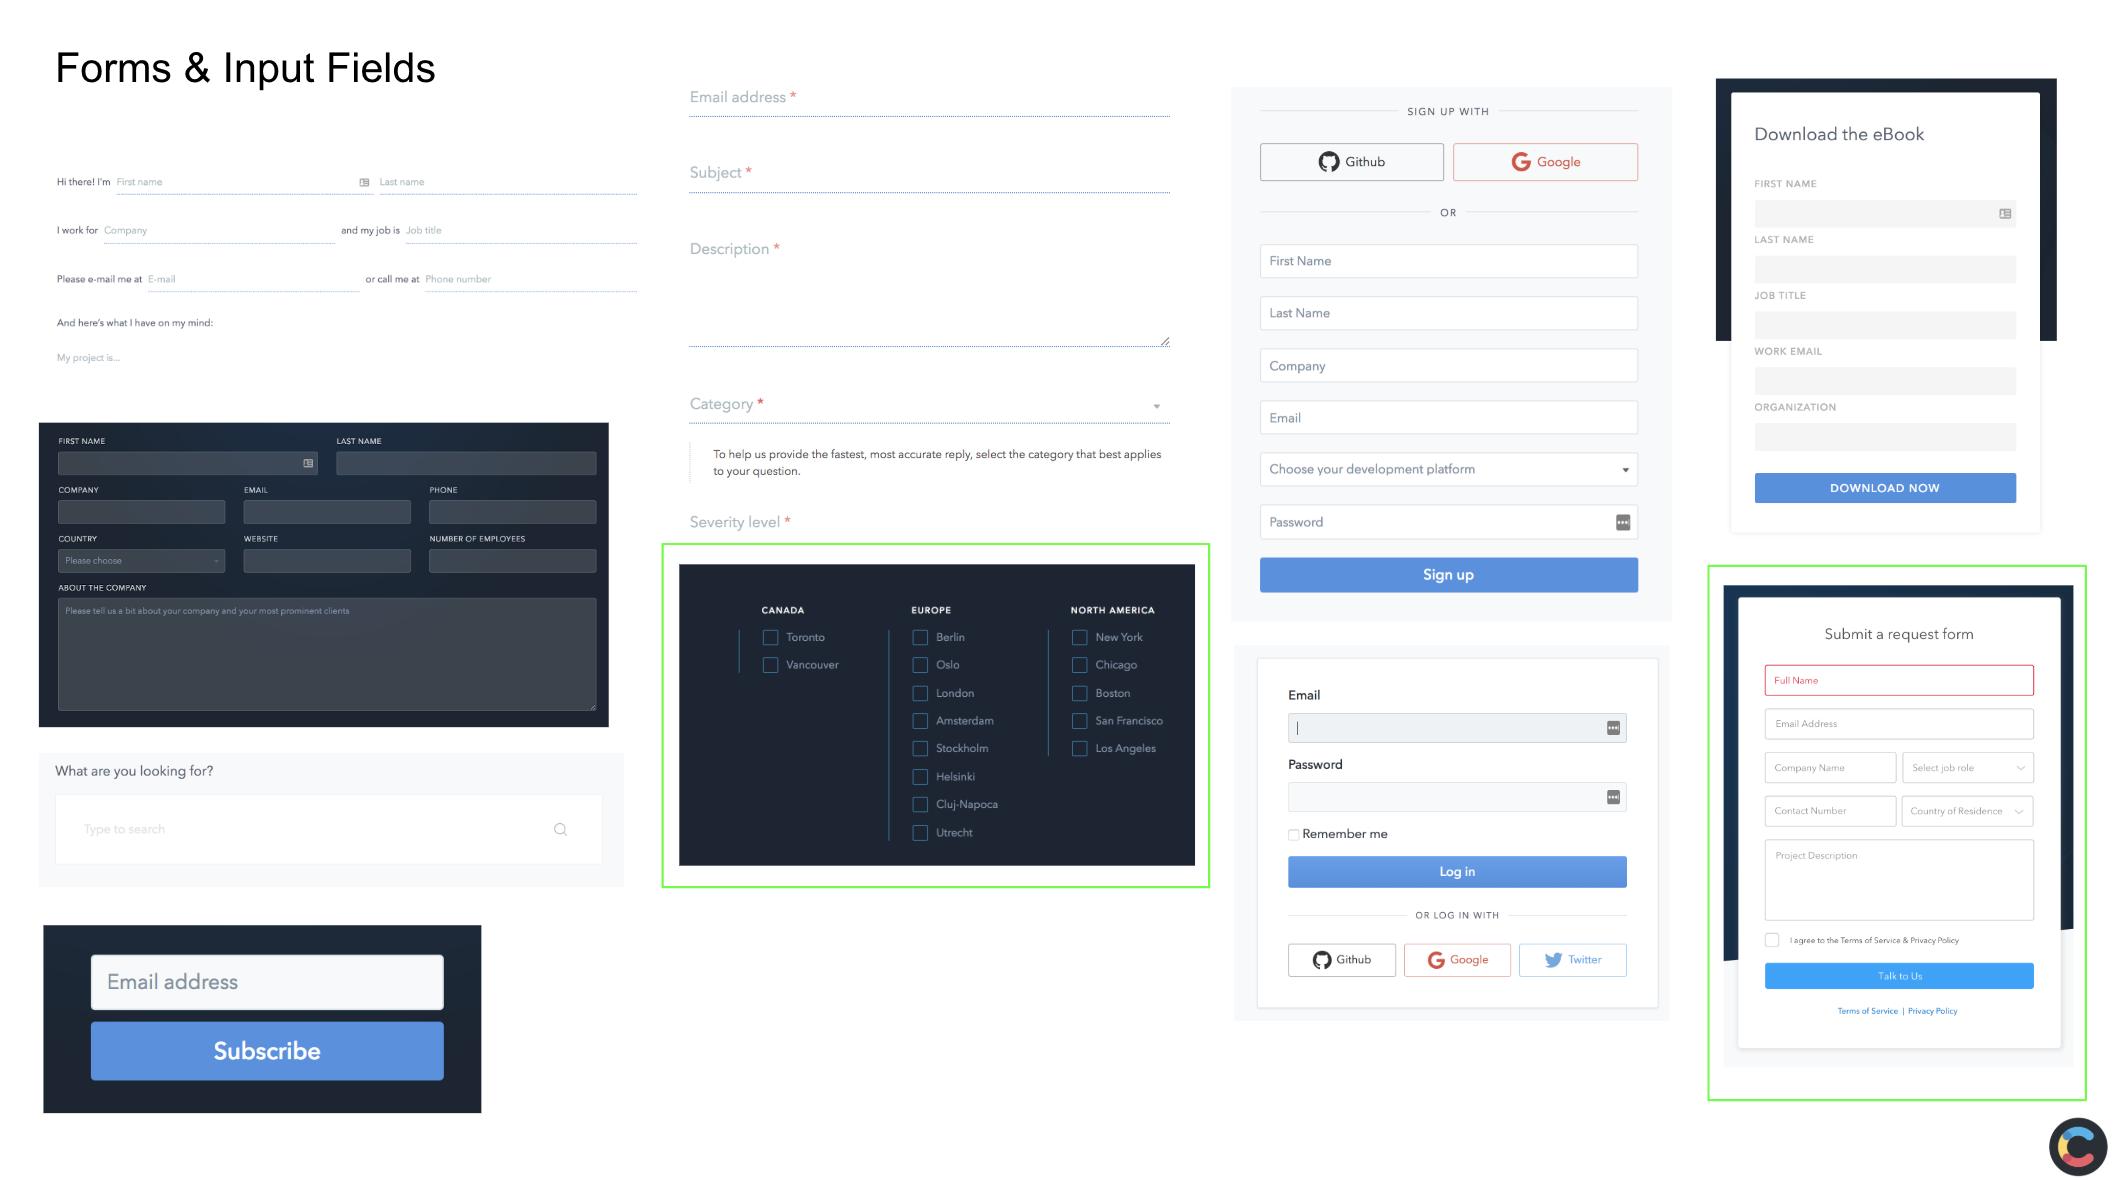 UI Audit: Inconsistent form styles